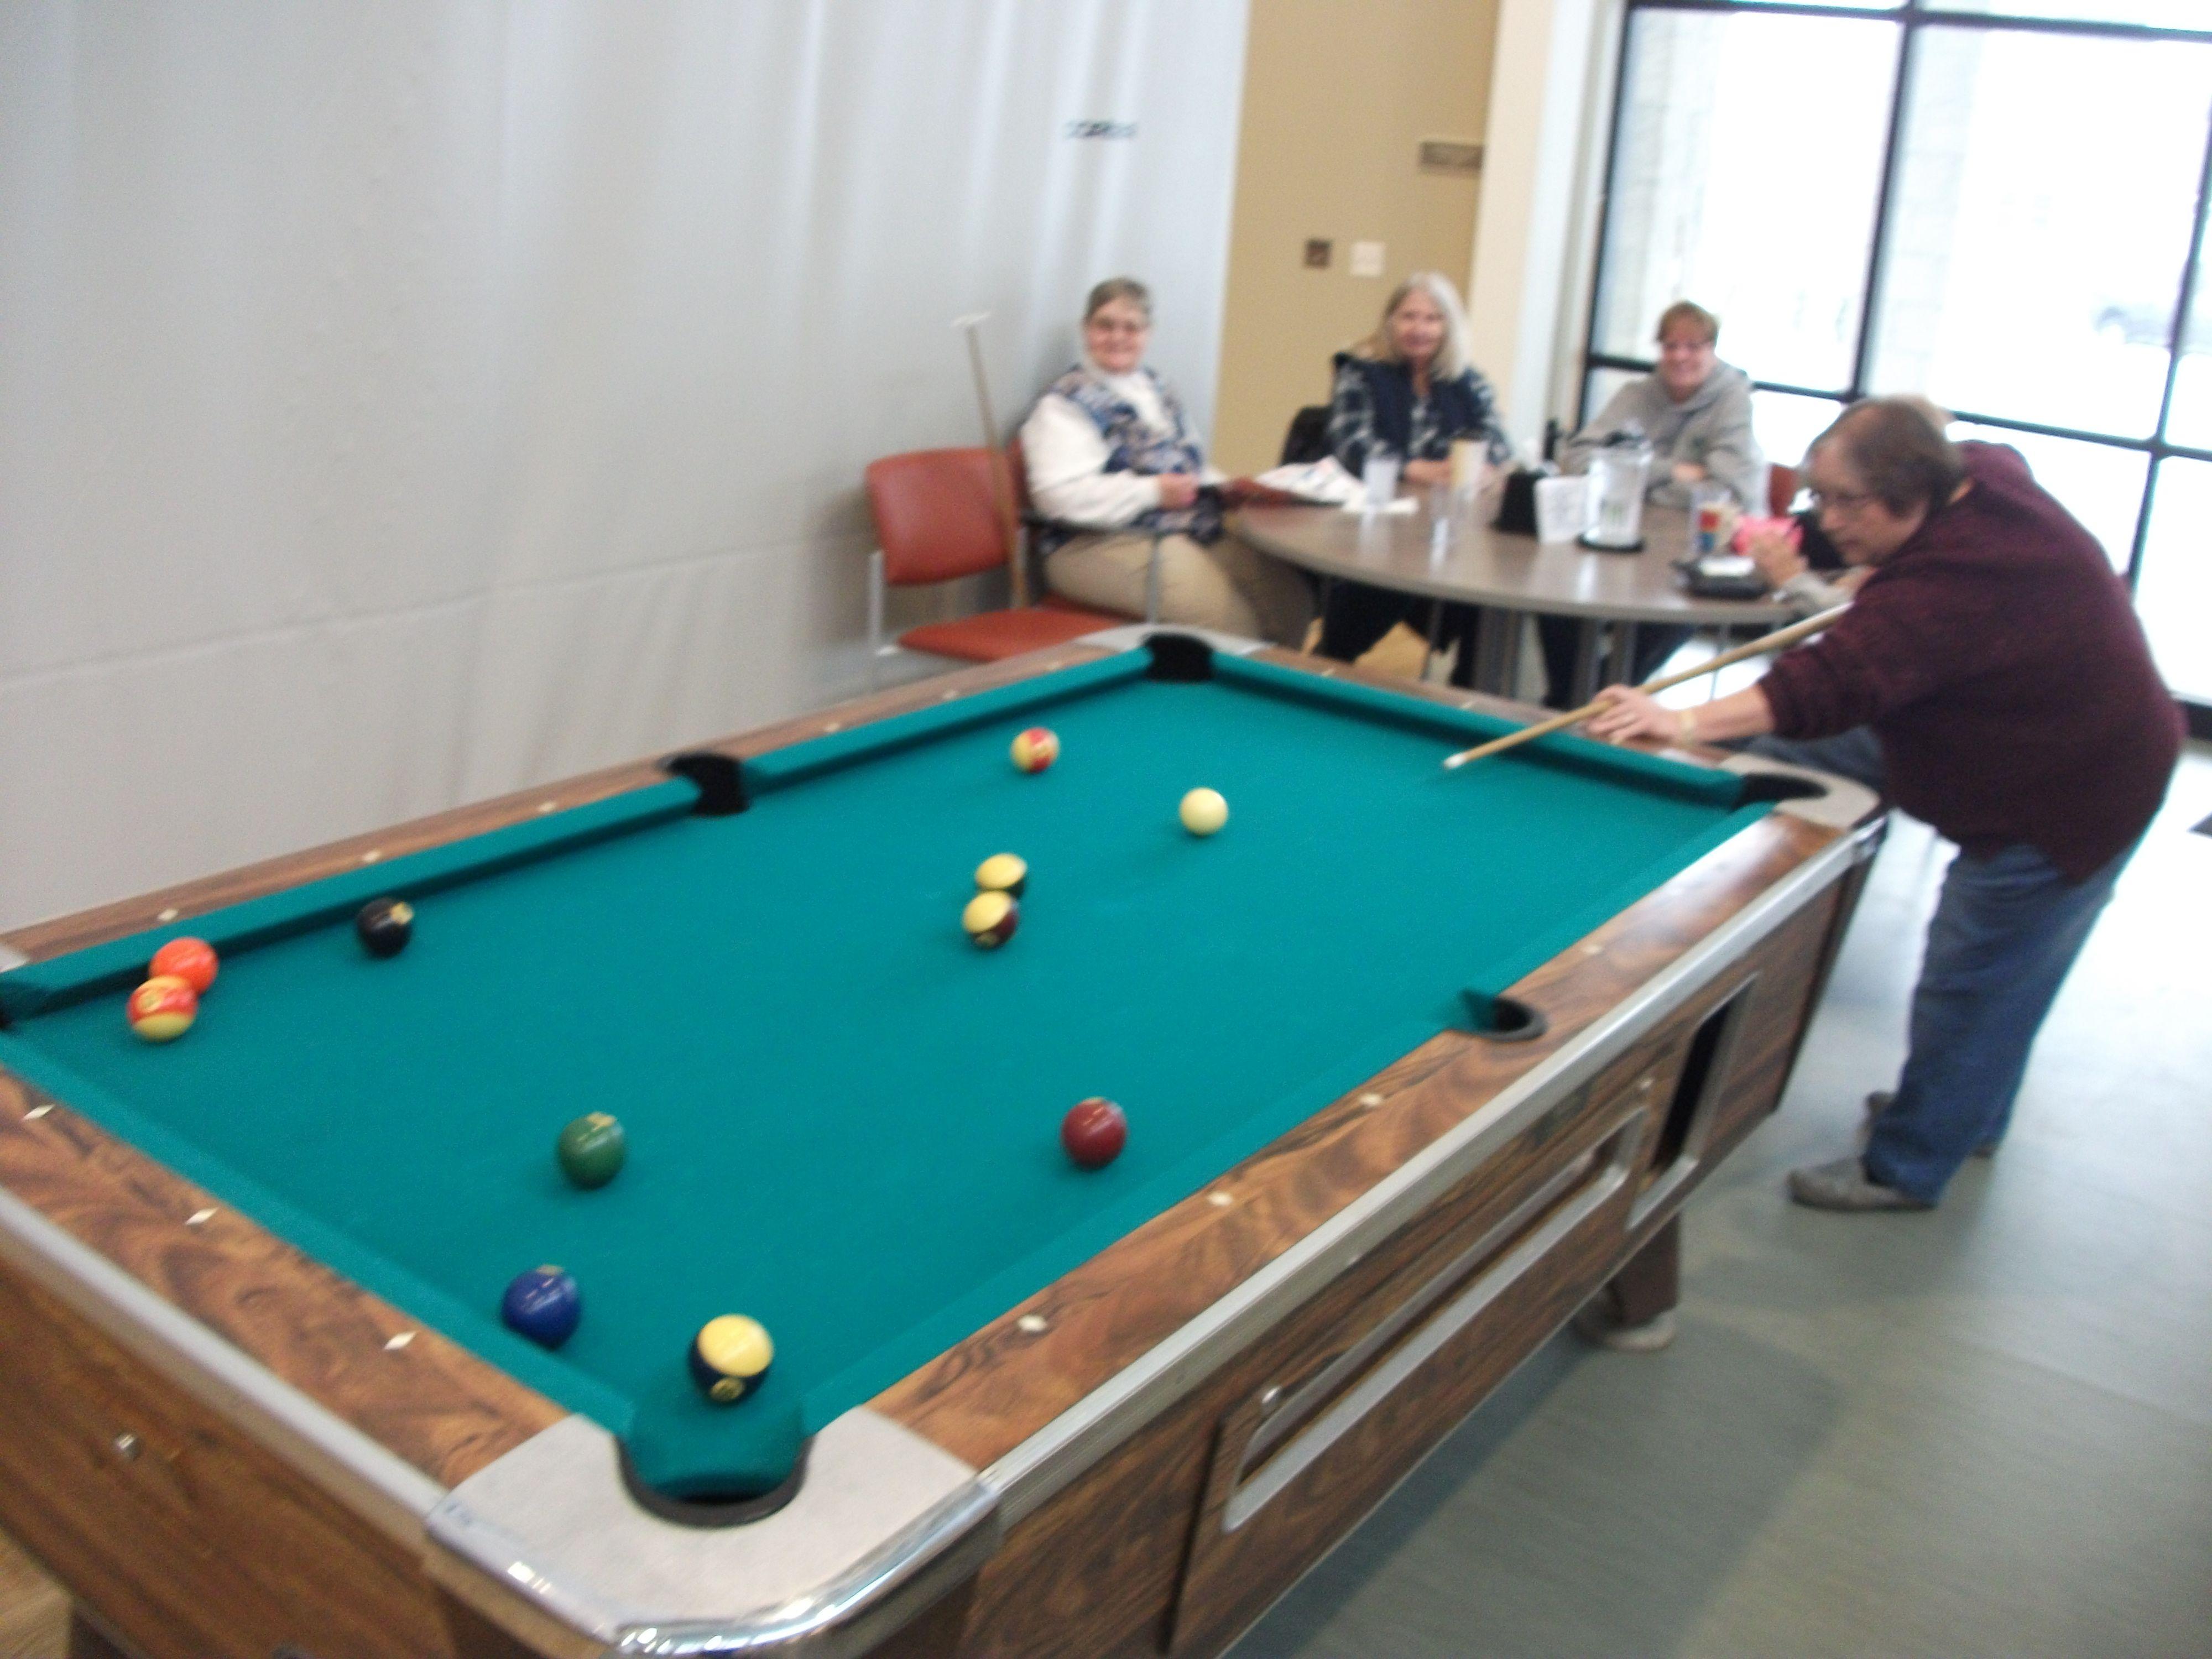 Pool game in progress